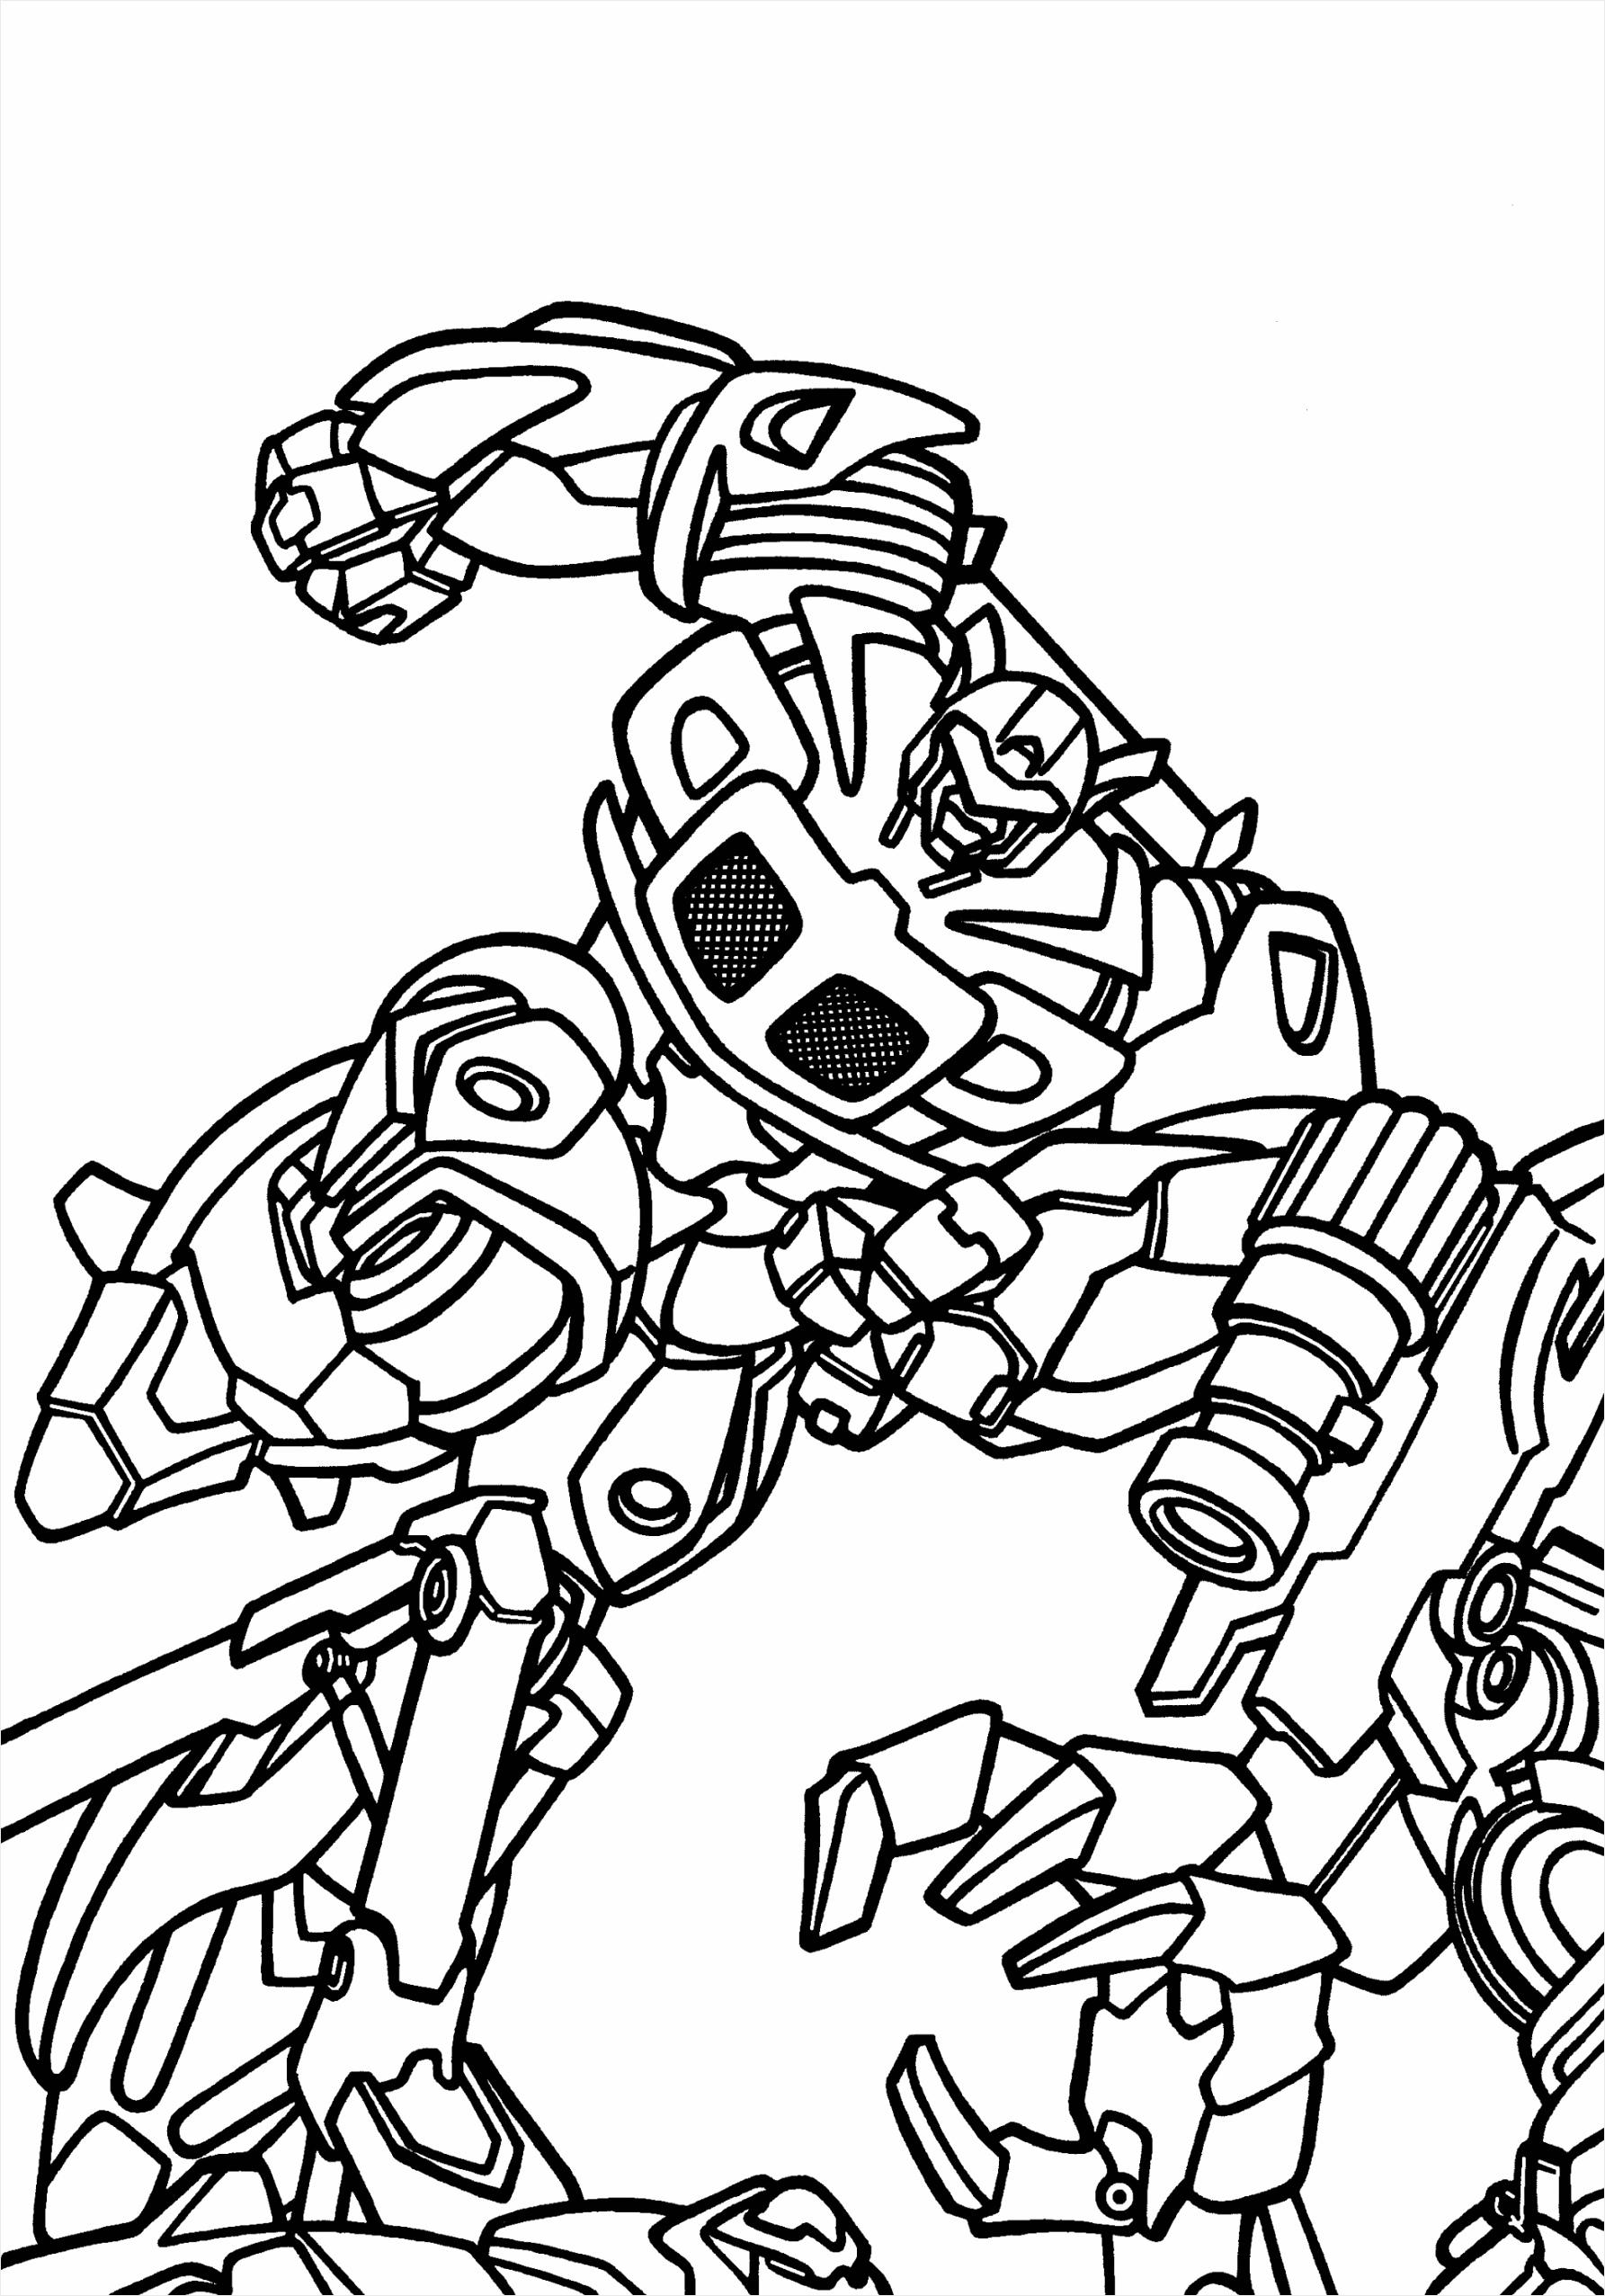 Transformers1 aeoye